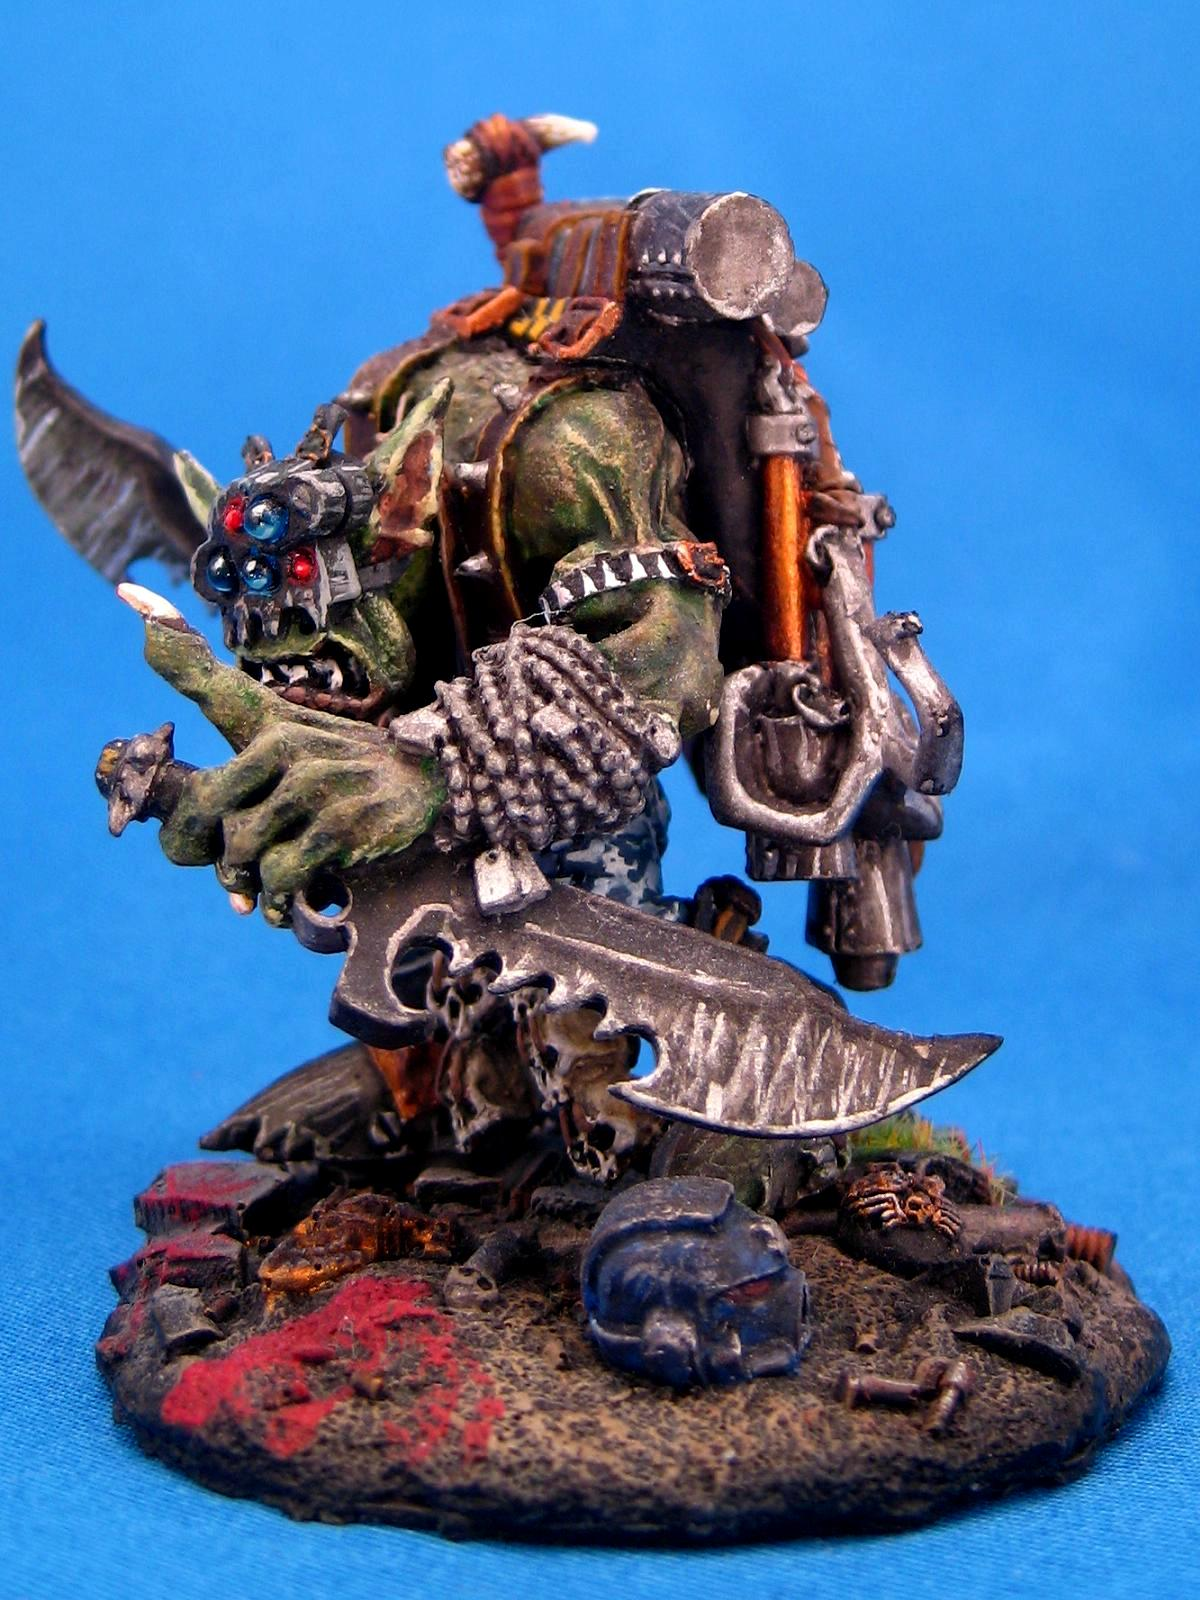 Orks, Snikrot, Warhammer 40,000